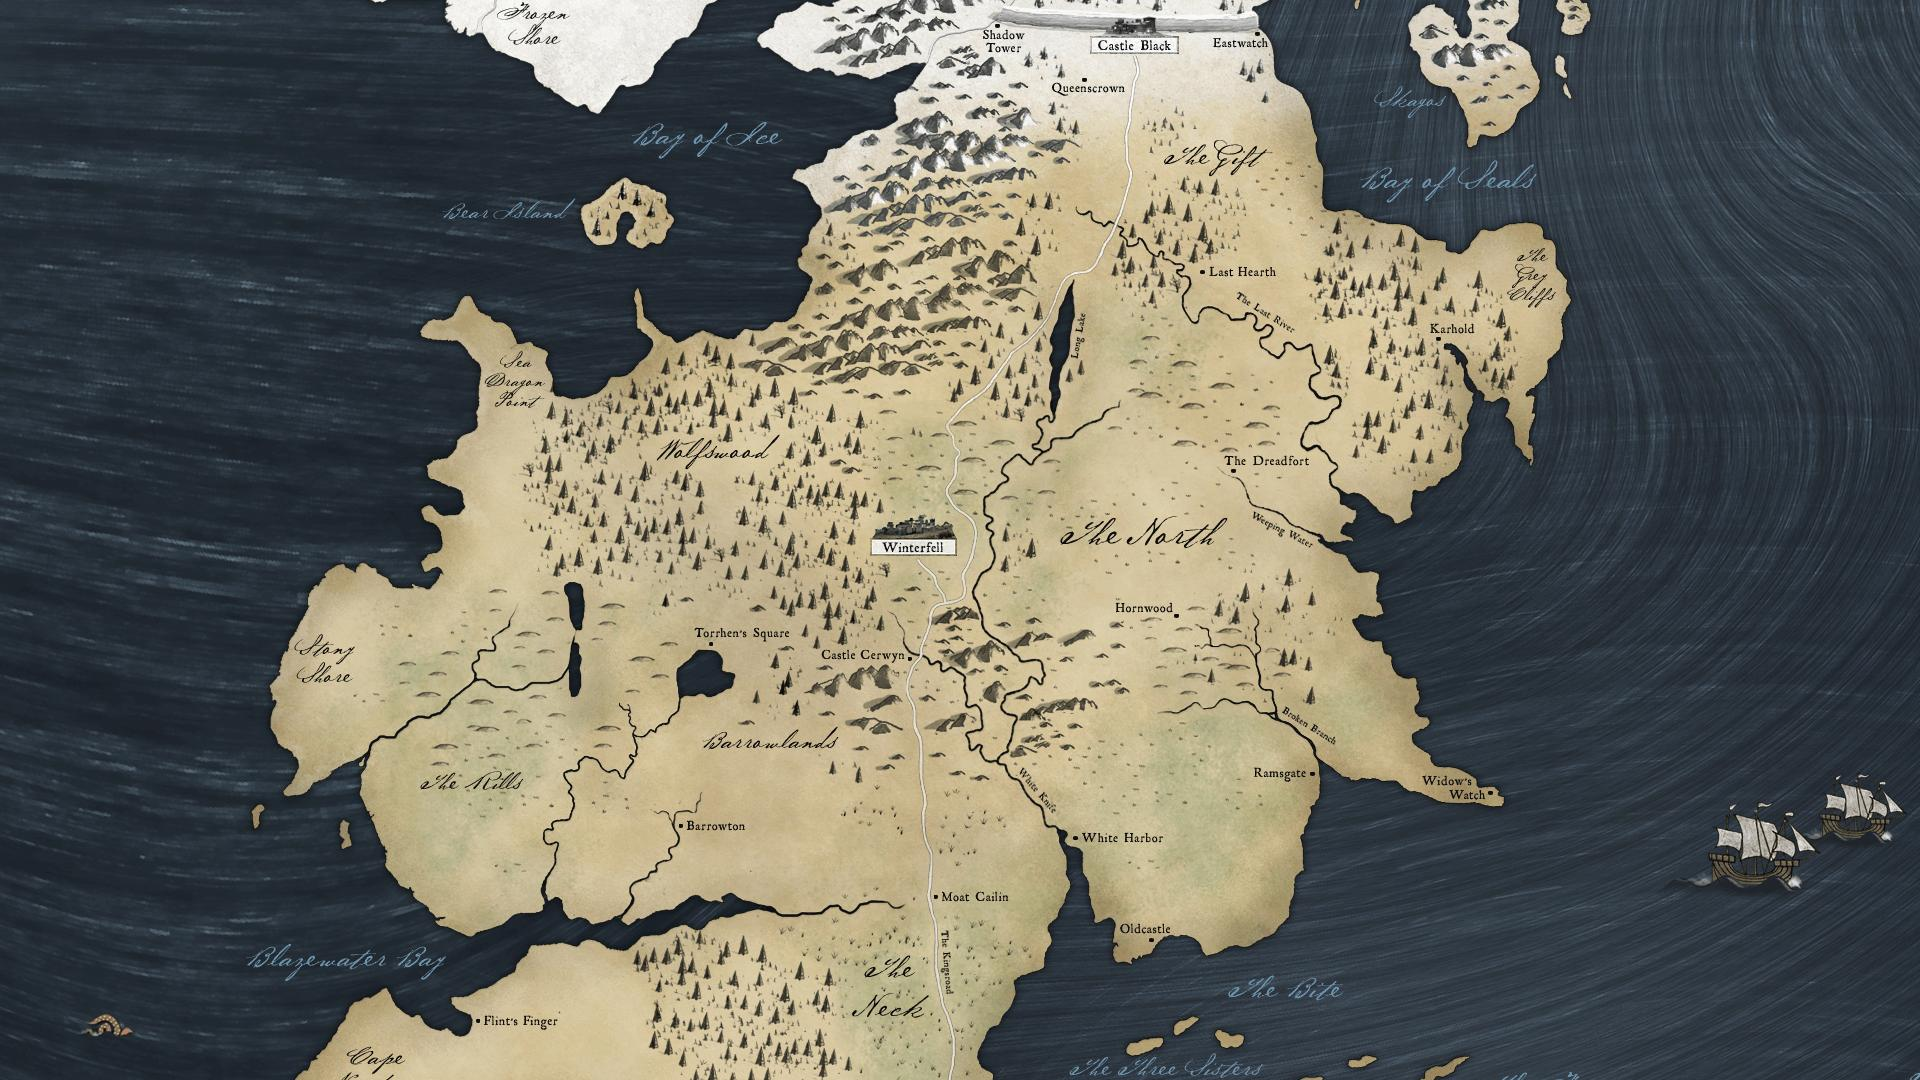 Map of westeros wallpaper wallpapersafari - Westeros map high resolution ...